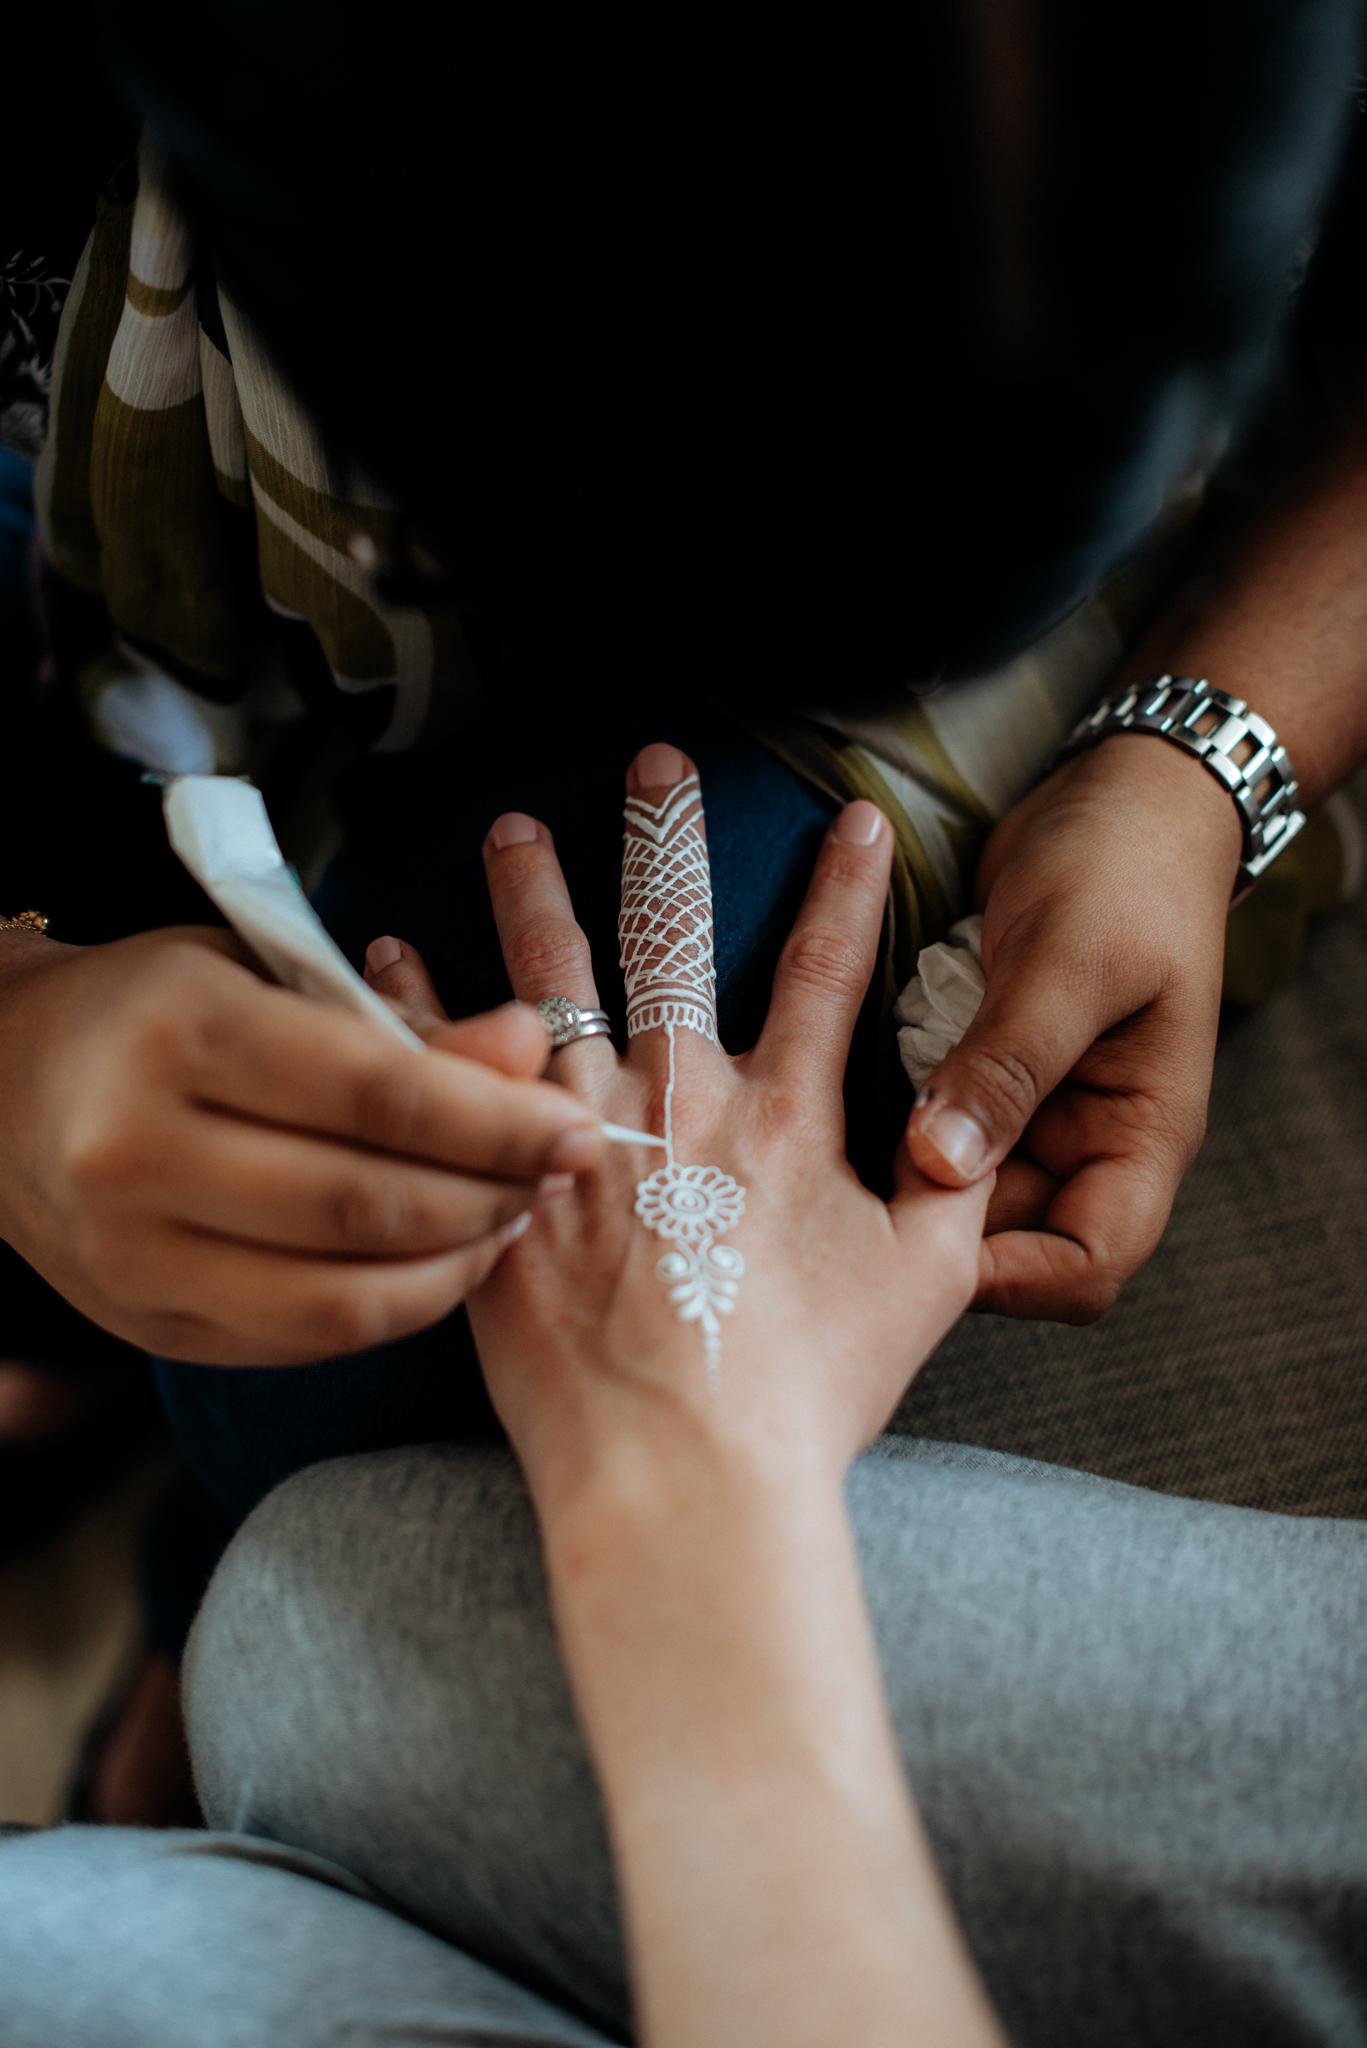 BRISBANE WEDDING PHOTOGRAPHER • BUNDALEER RAINFOREST GARDENS WEDDING • ONE DAY BRIDAL WEDDING GOWN • ROXY HOTTEN CELEBRANT • LOVELENSCAPES PHOTOGRAPHY • 10.jpg